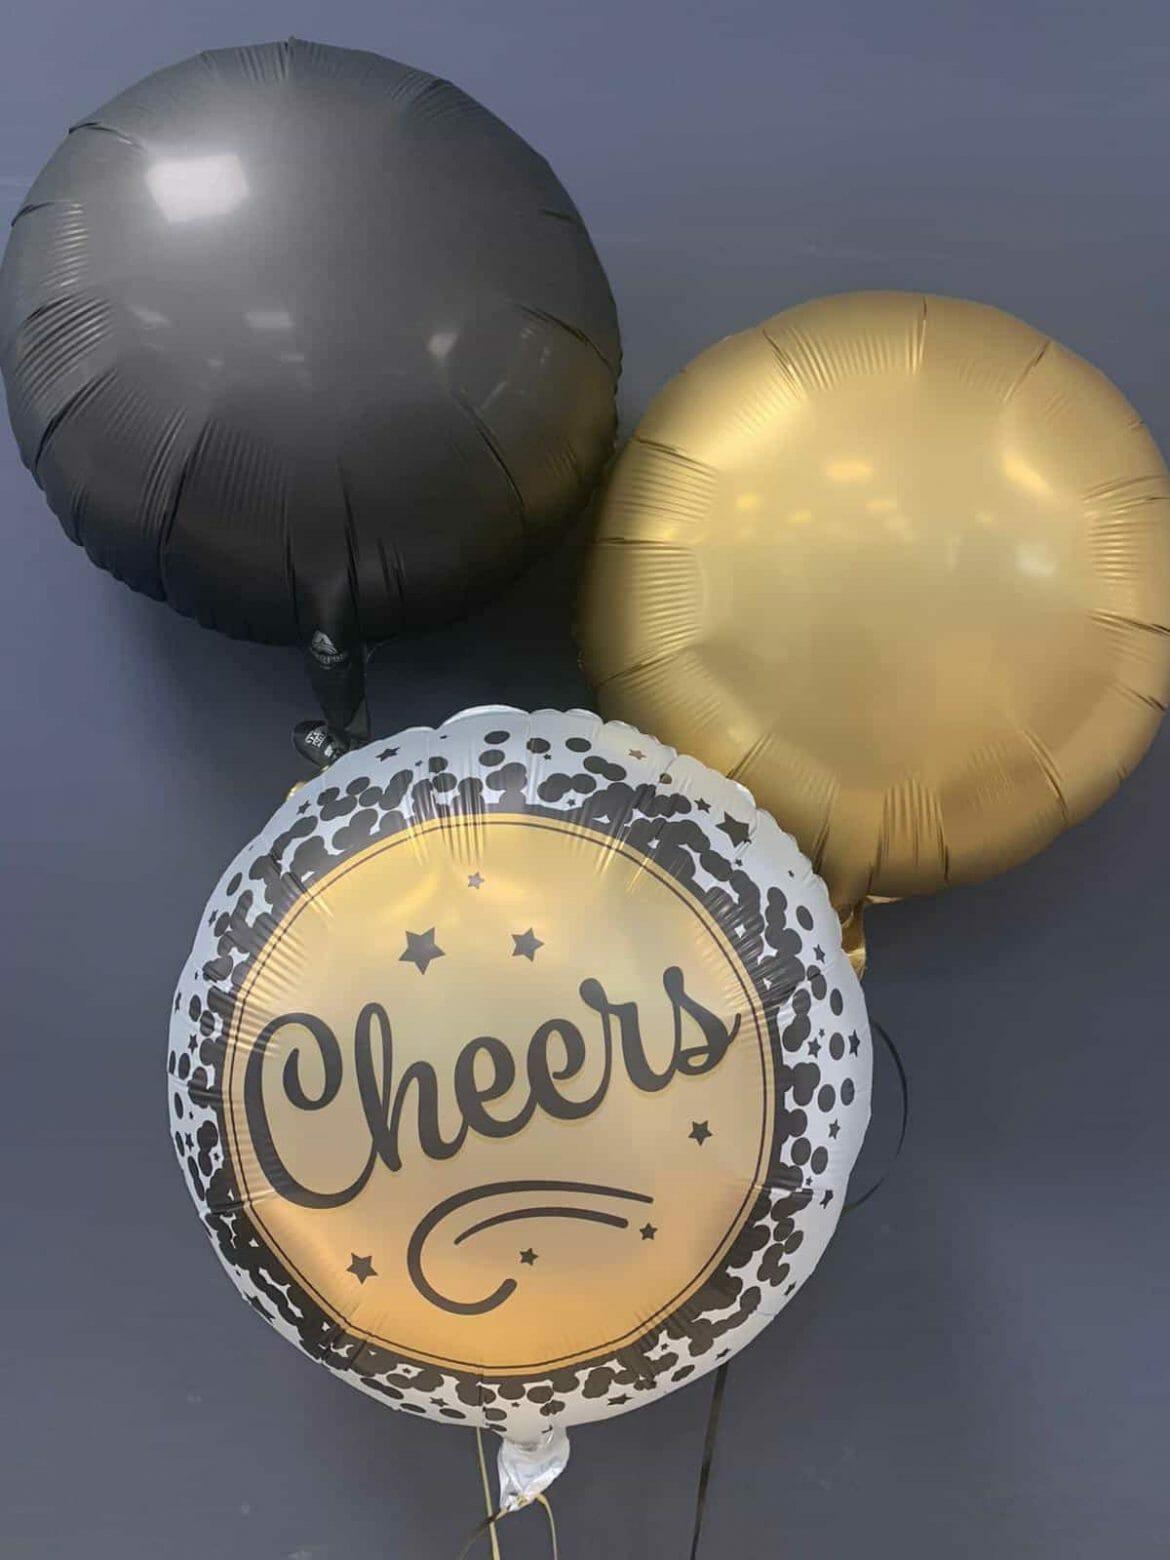 Ballon Cheers € 5,90<br />Dekoballons je € 4,50 1